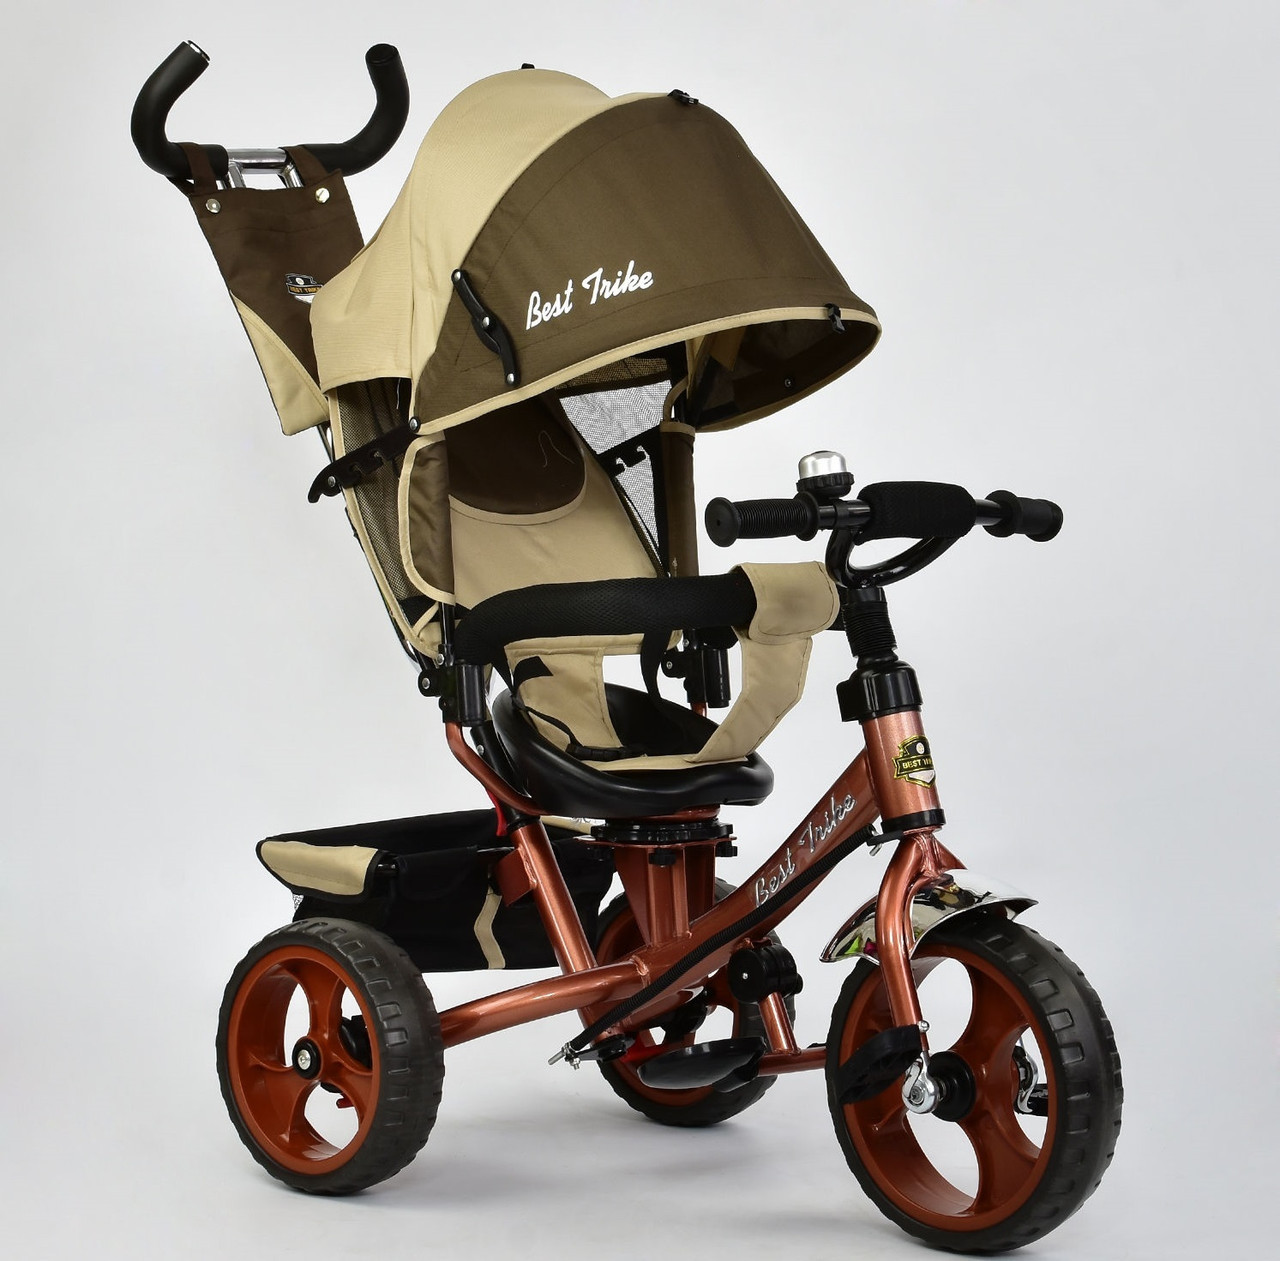 Best Trike Велосипед Best Trike 5700 3320 Beige (5700)